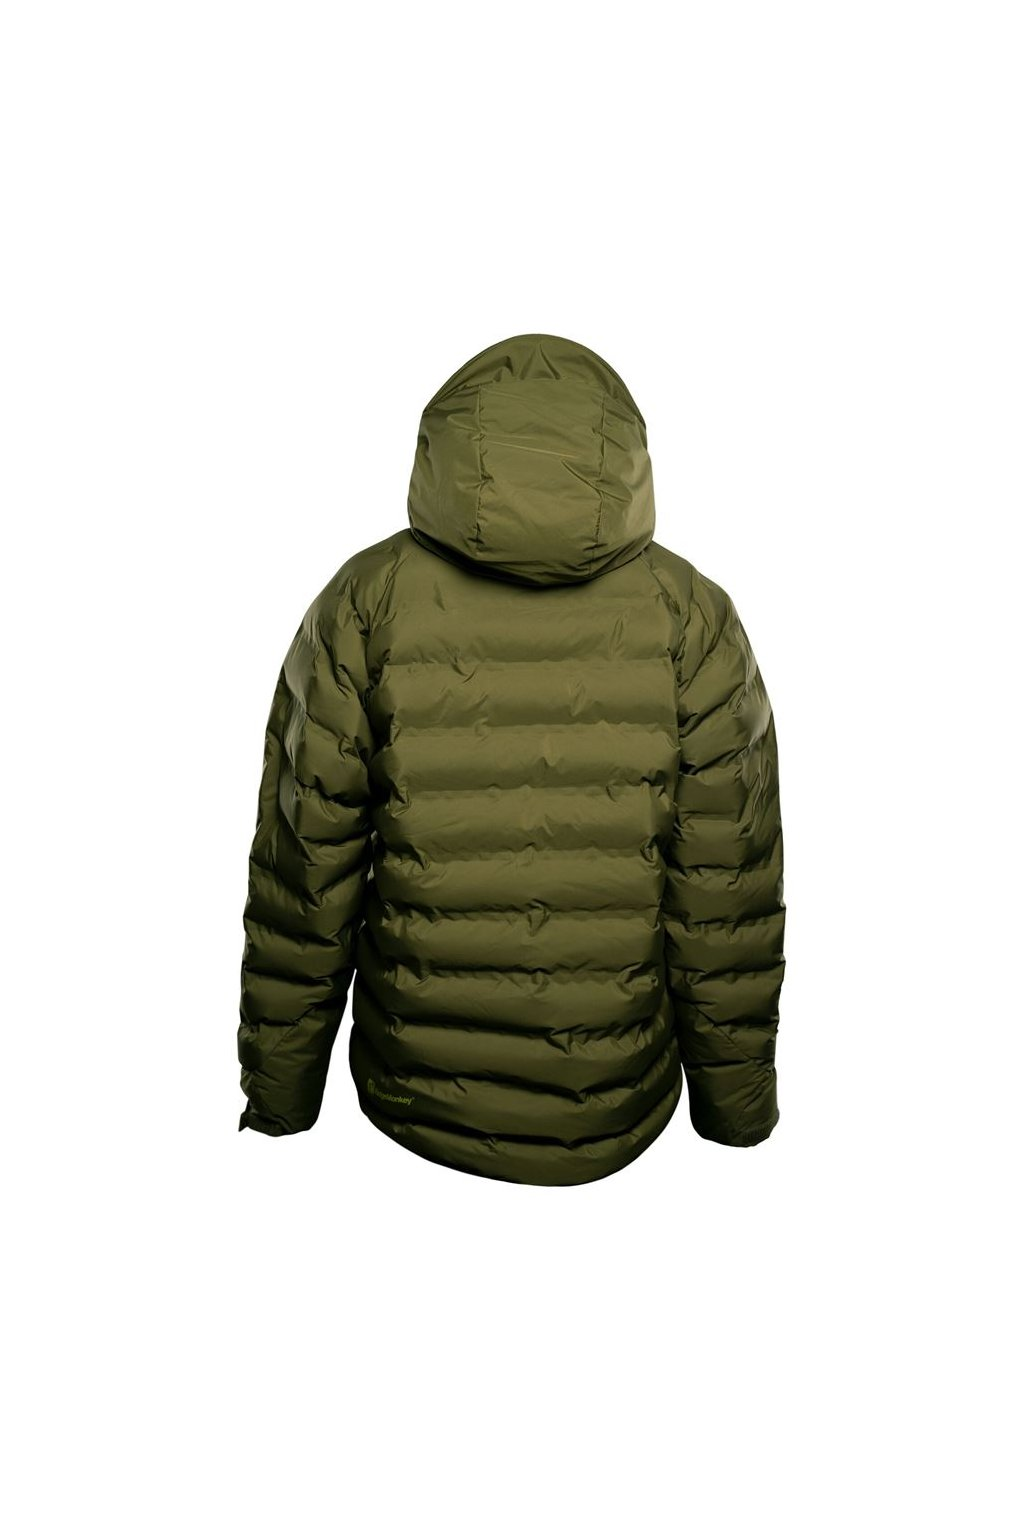 RidgeMonkey: Bunda APEarel Dropback K2 Waterproof Coat Green Velikost XXXL